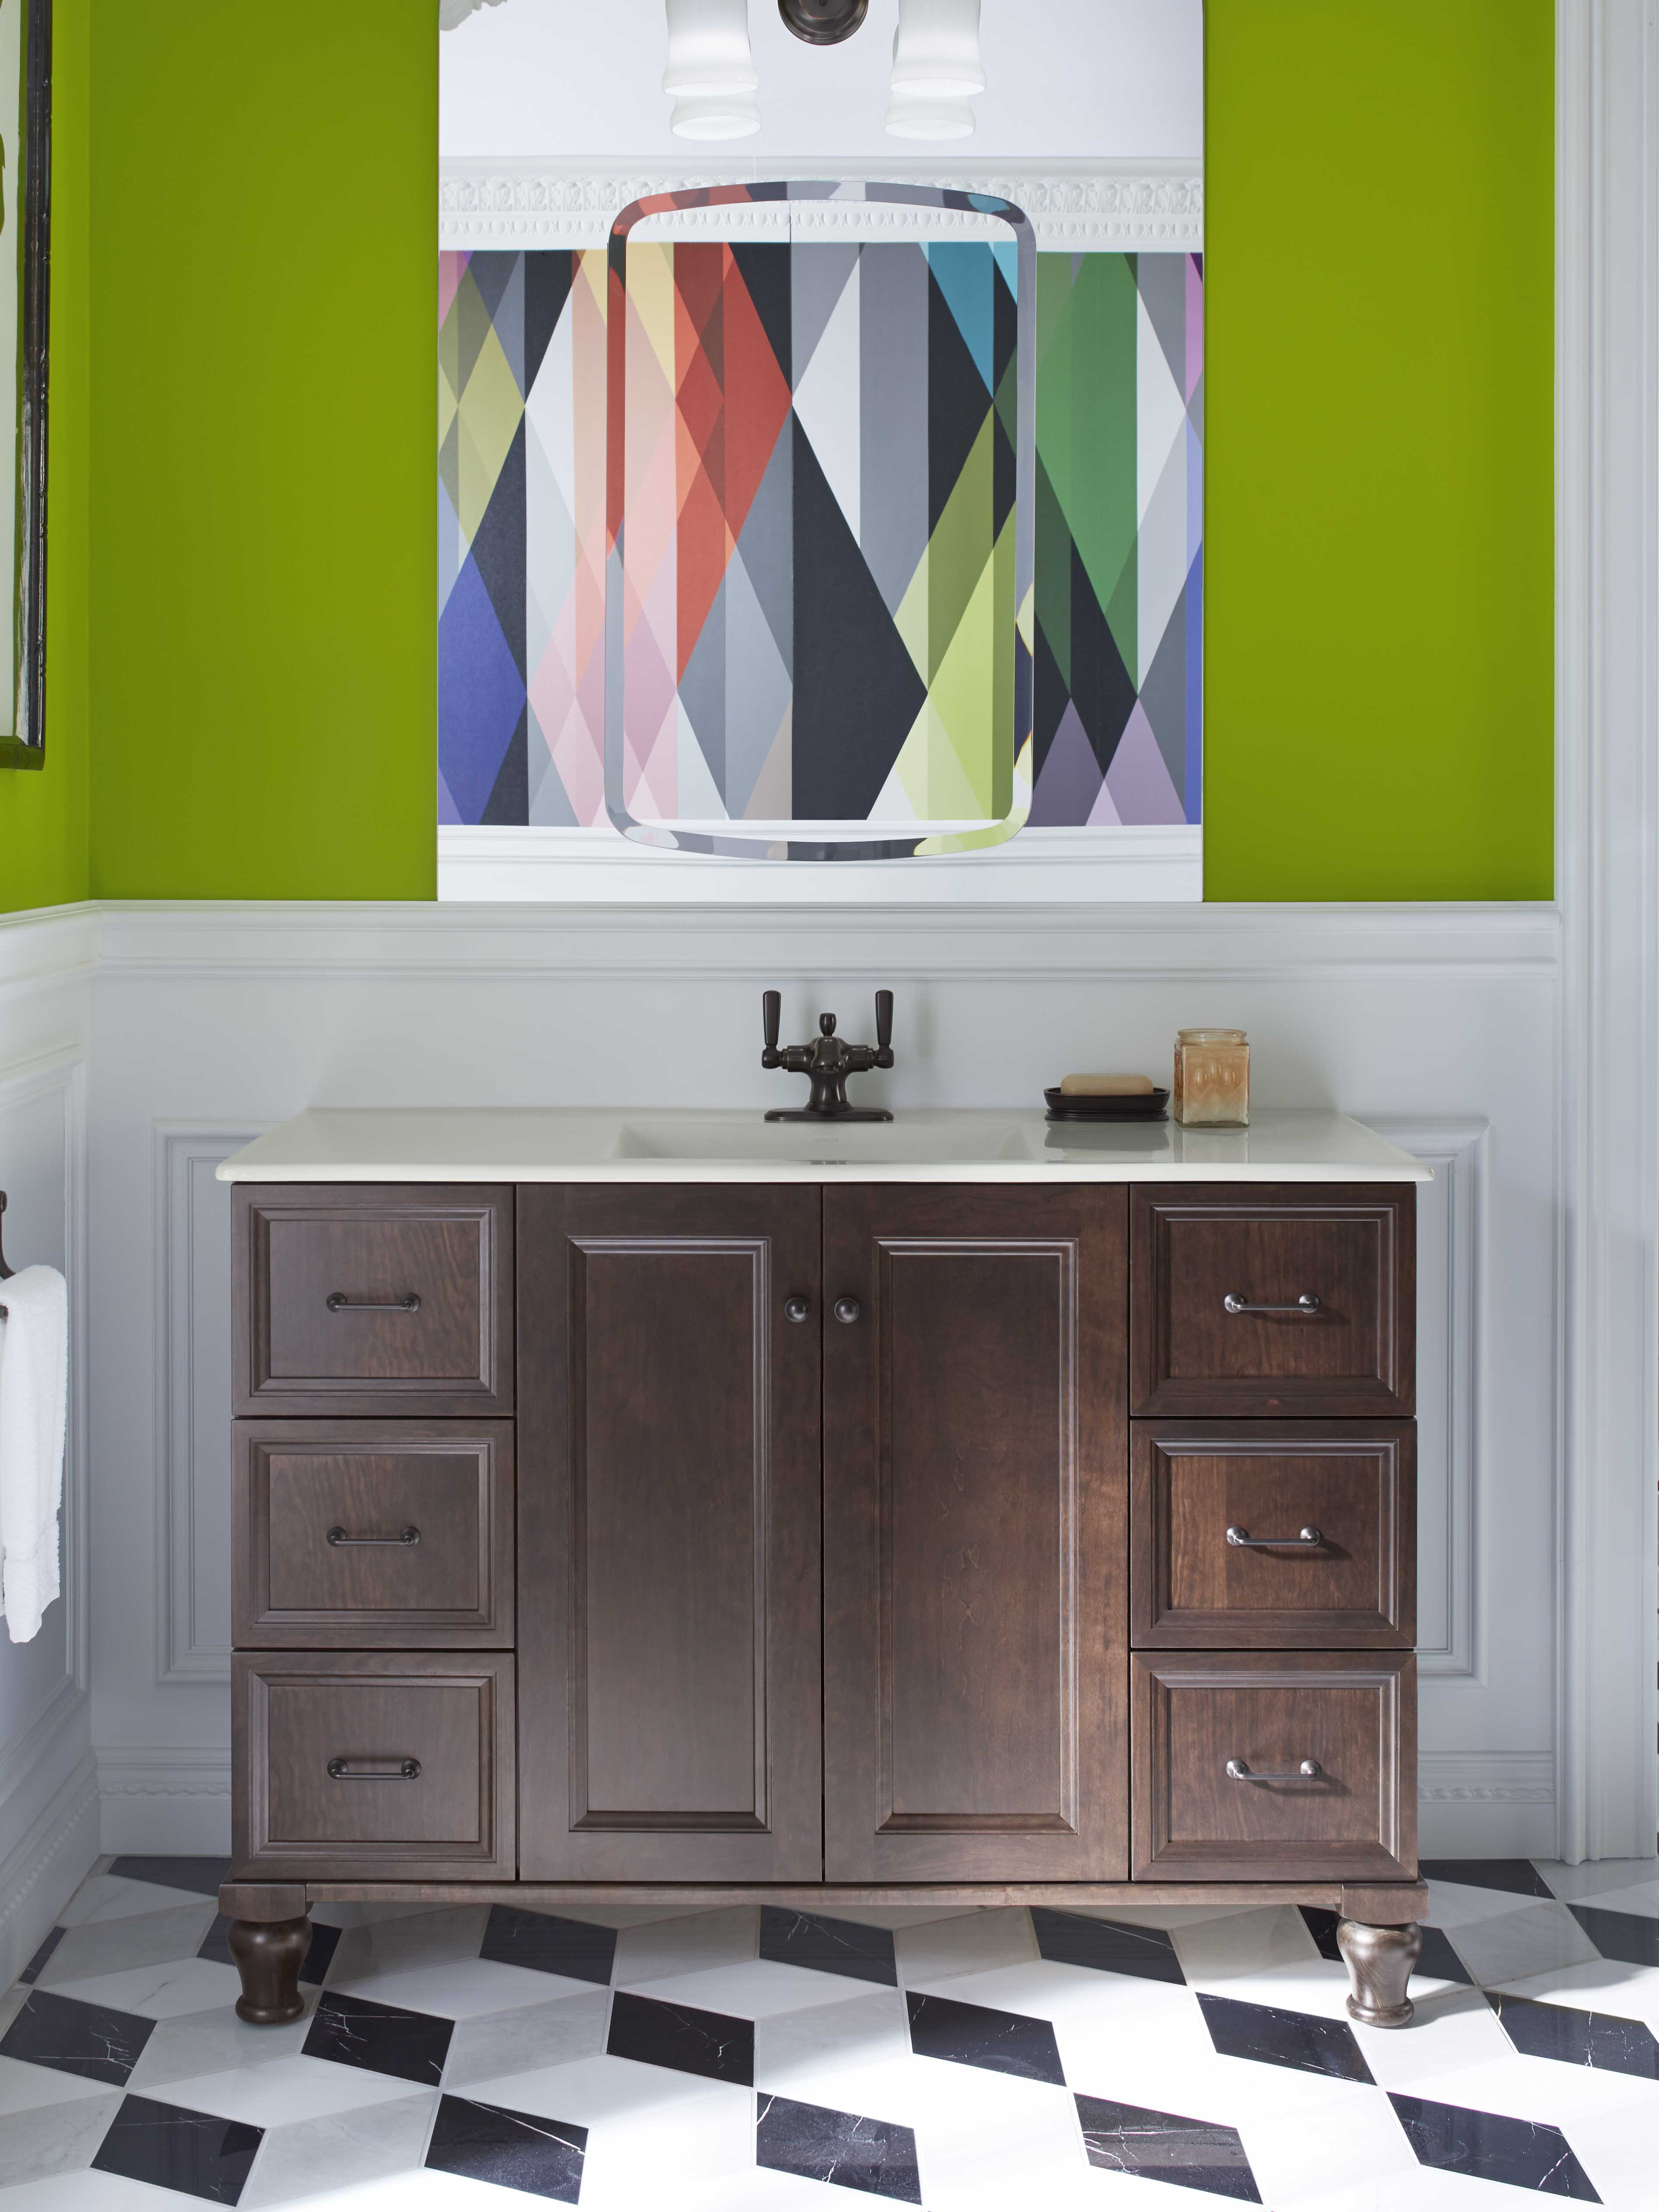 Damask® Vanity     Bancroft® medicine cabinet     Bancroft Faucet     Blending a dark wood vanity with playful patterns creates a compelling bathroom design.